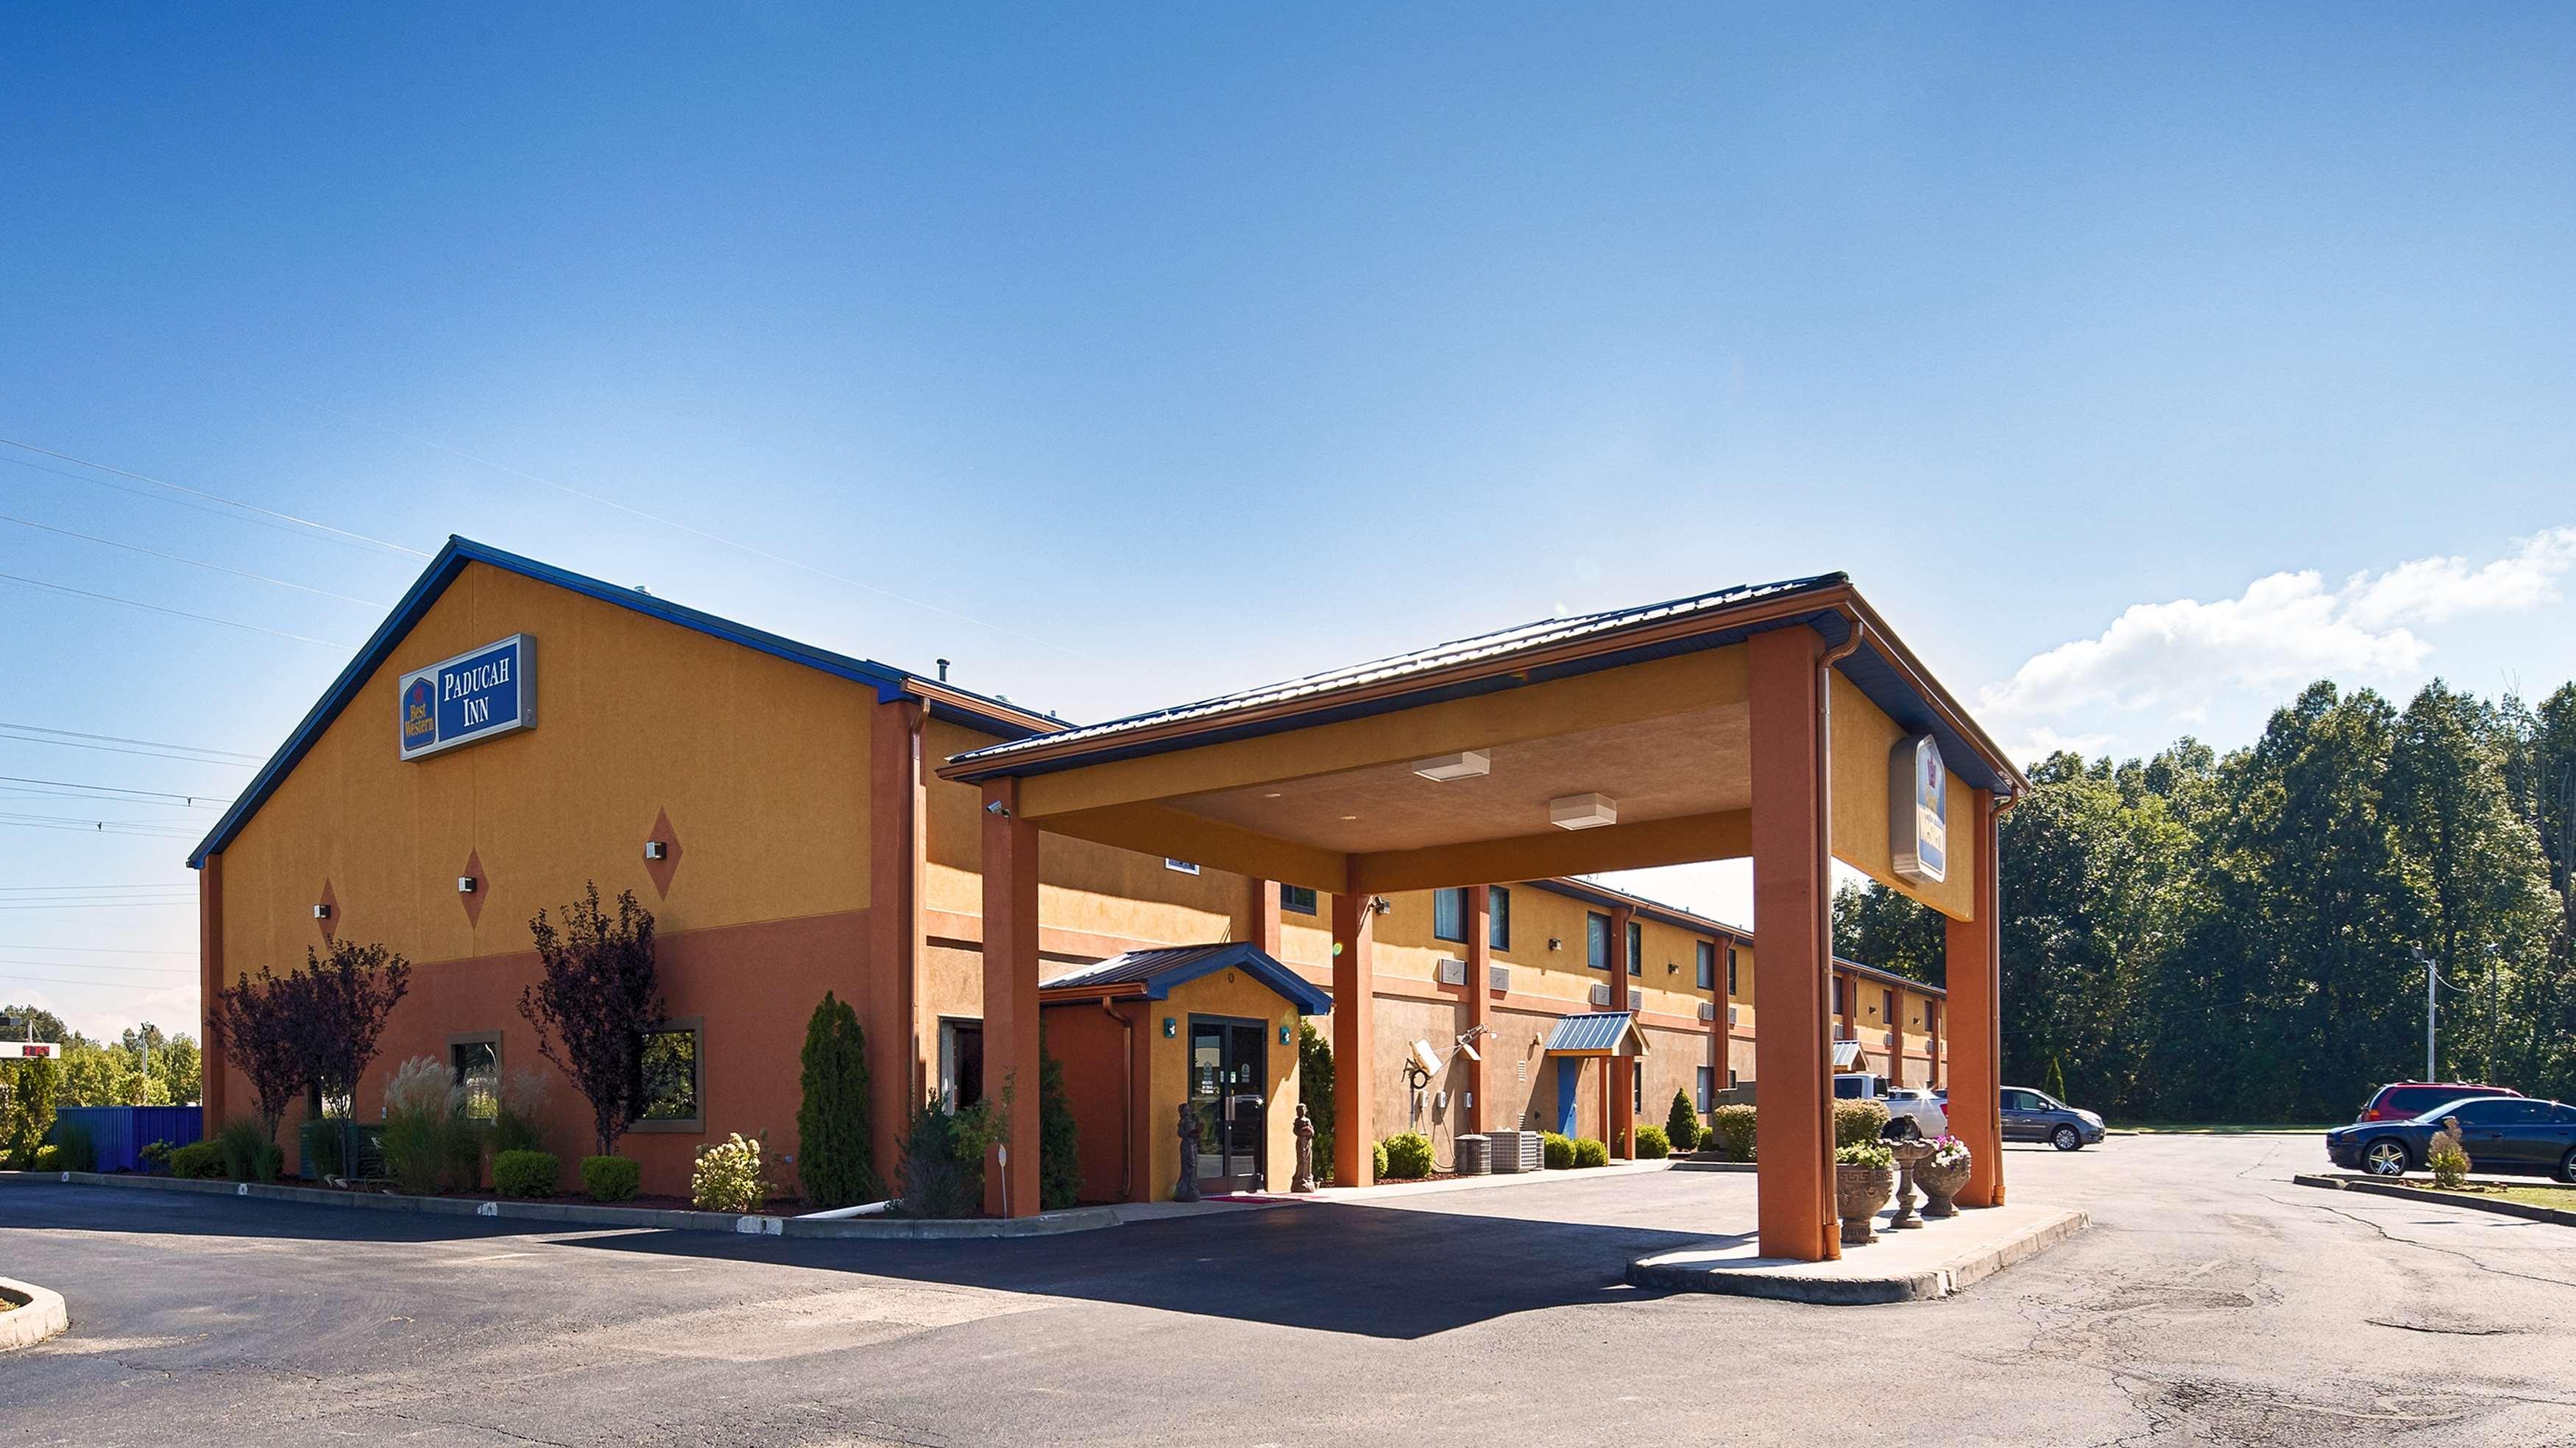 Hotels In Paducah Ky Near I